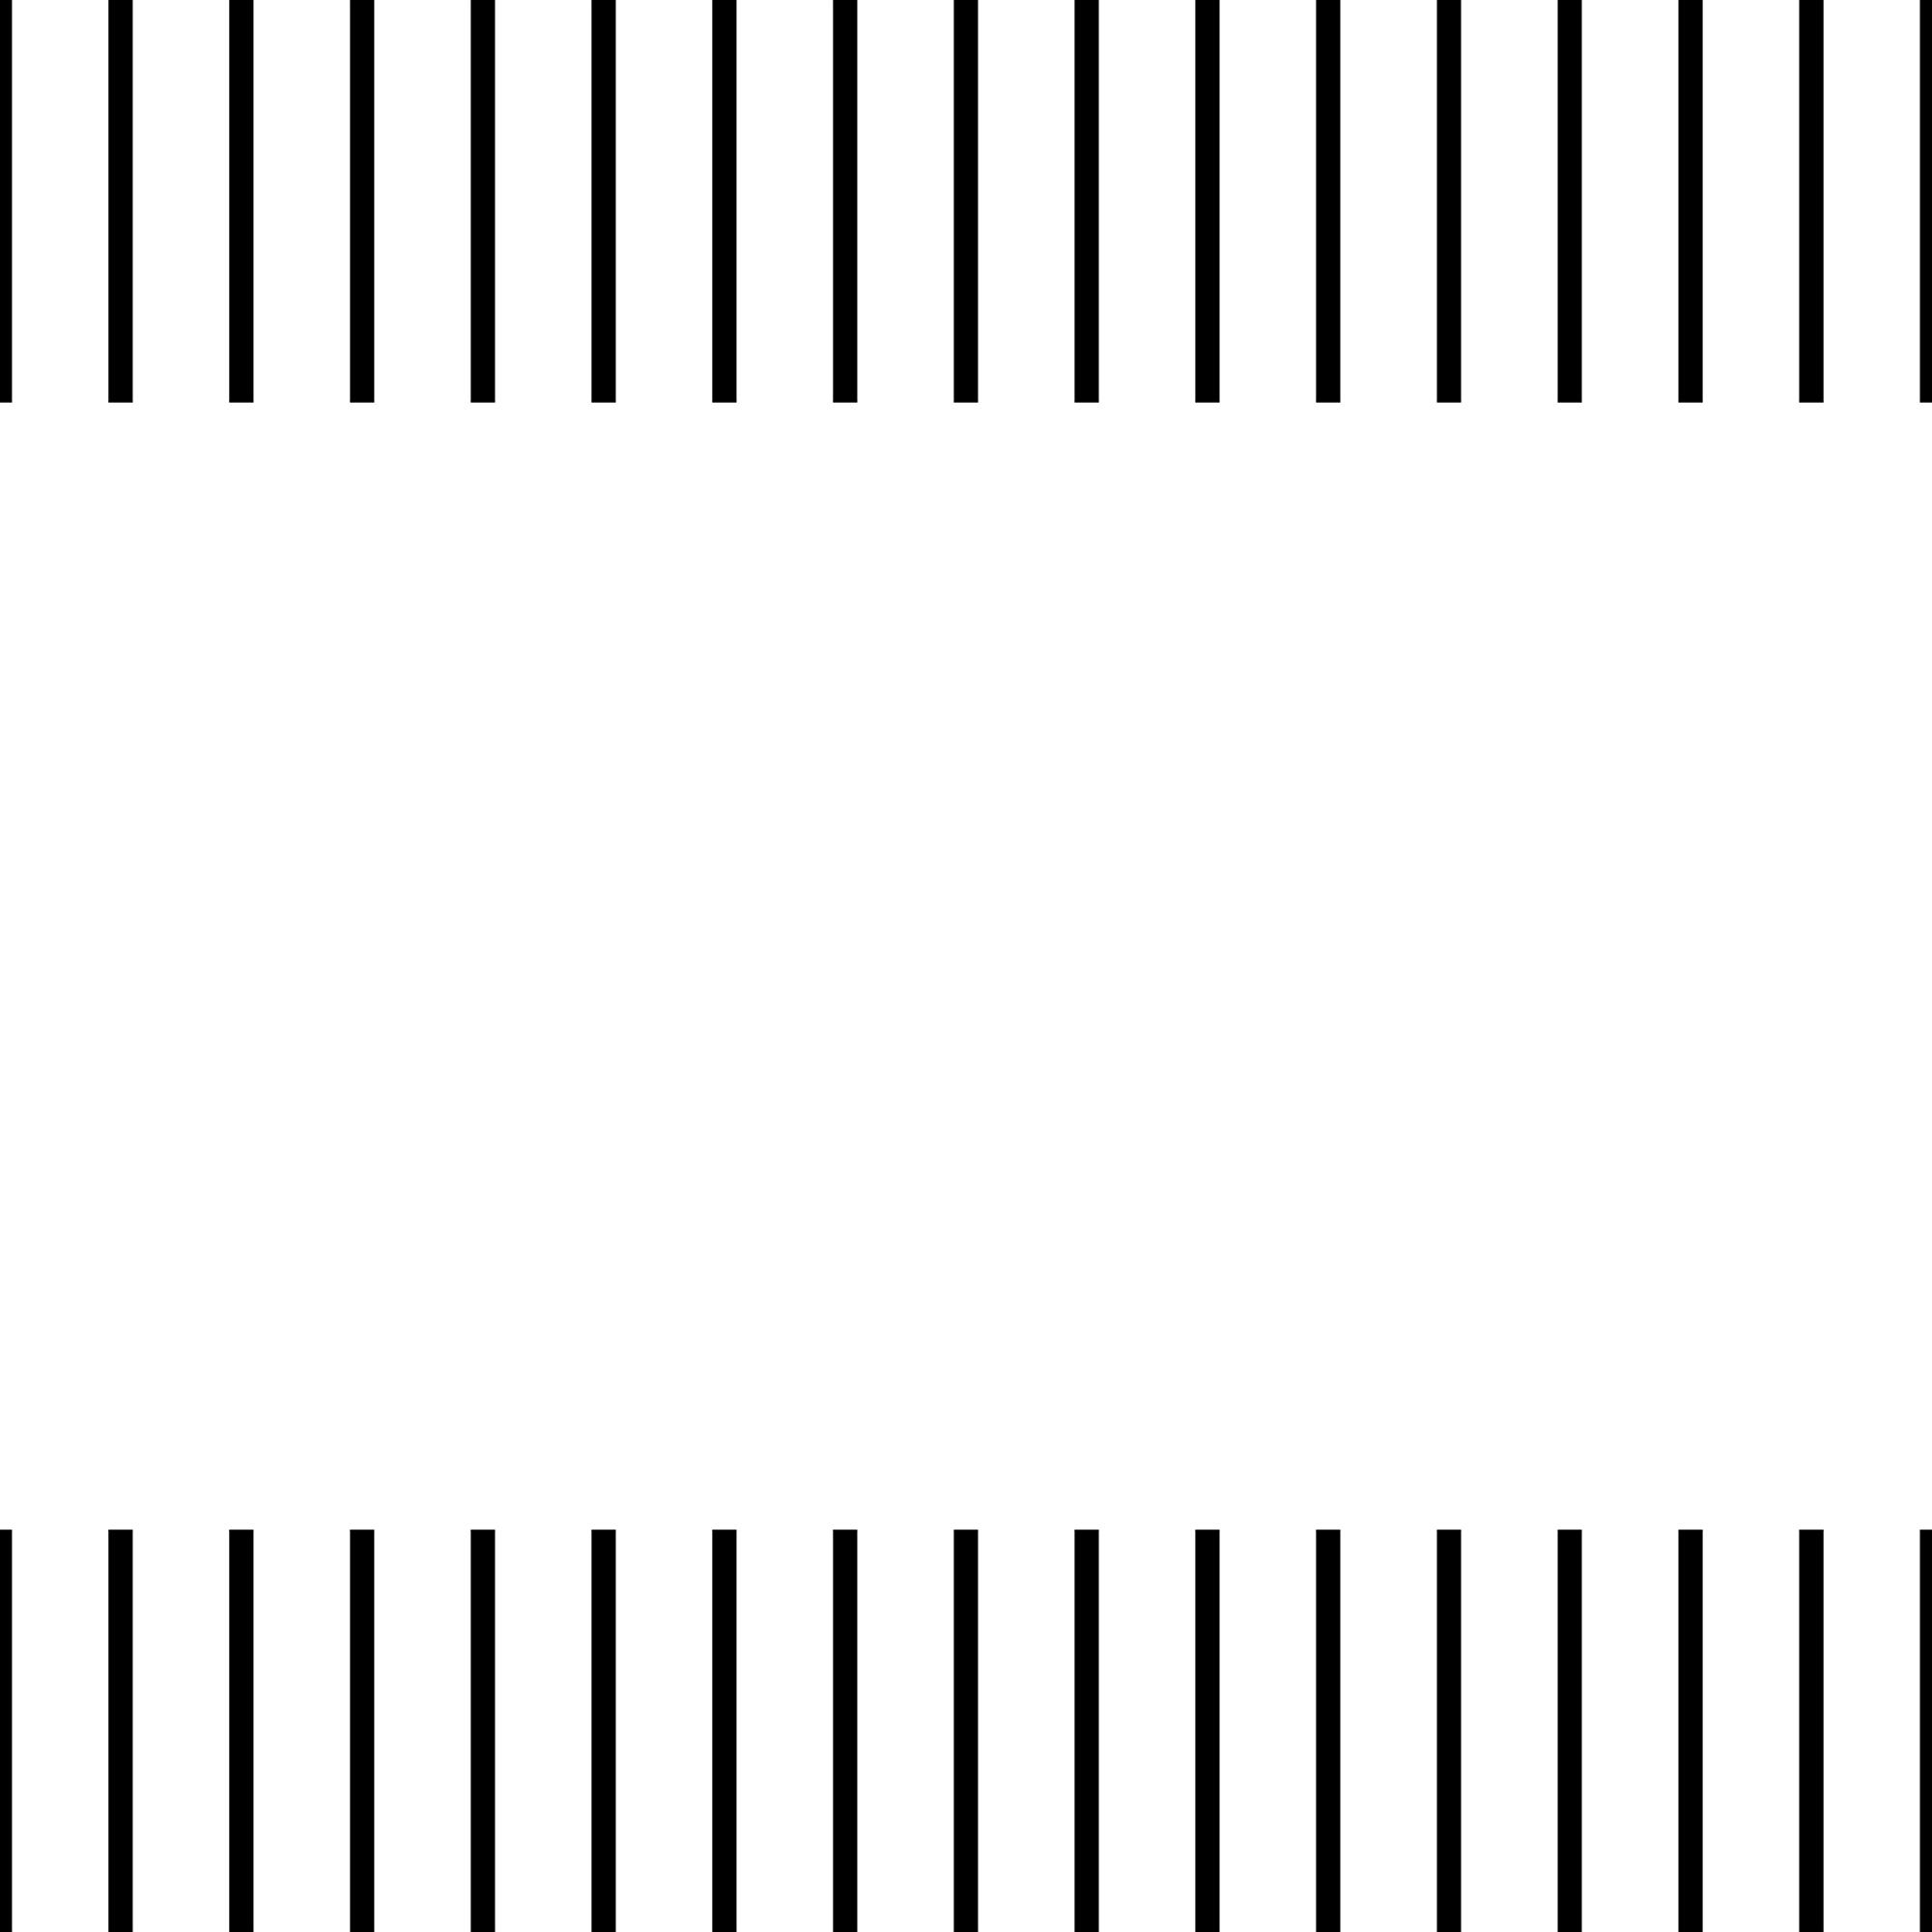 sheepairsupport_FF10_8K (14).jpg